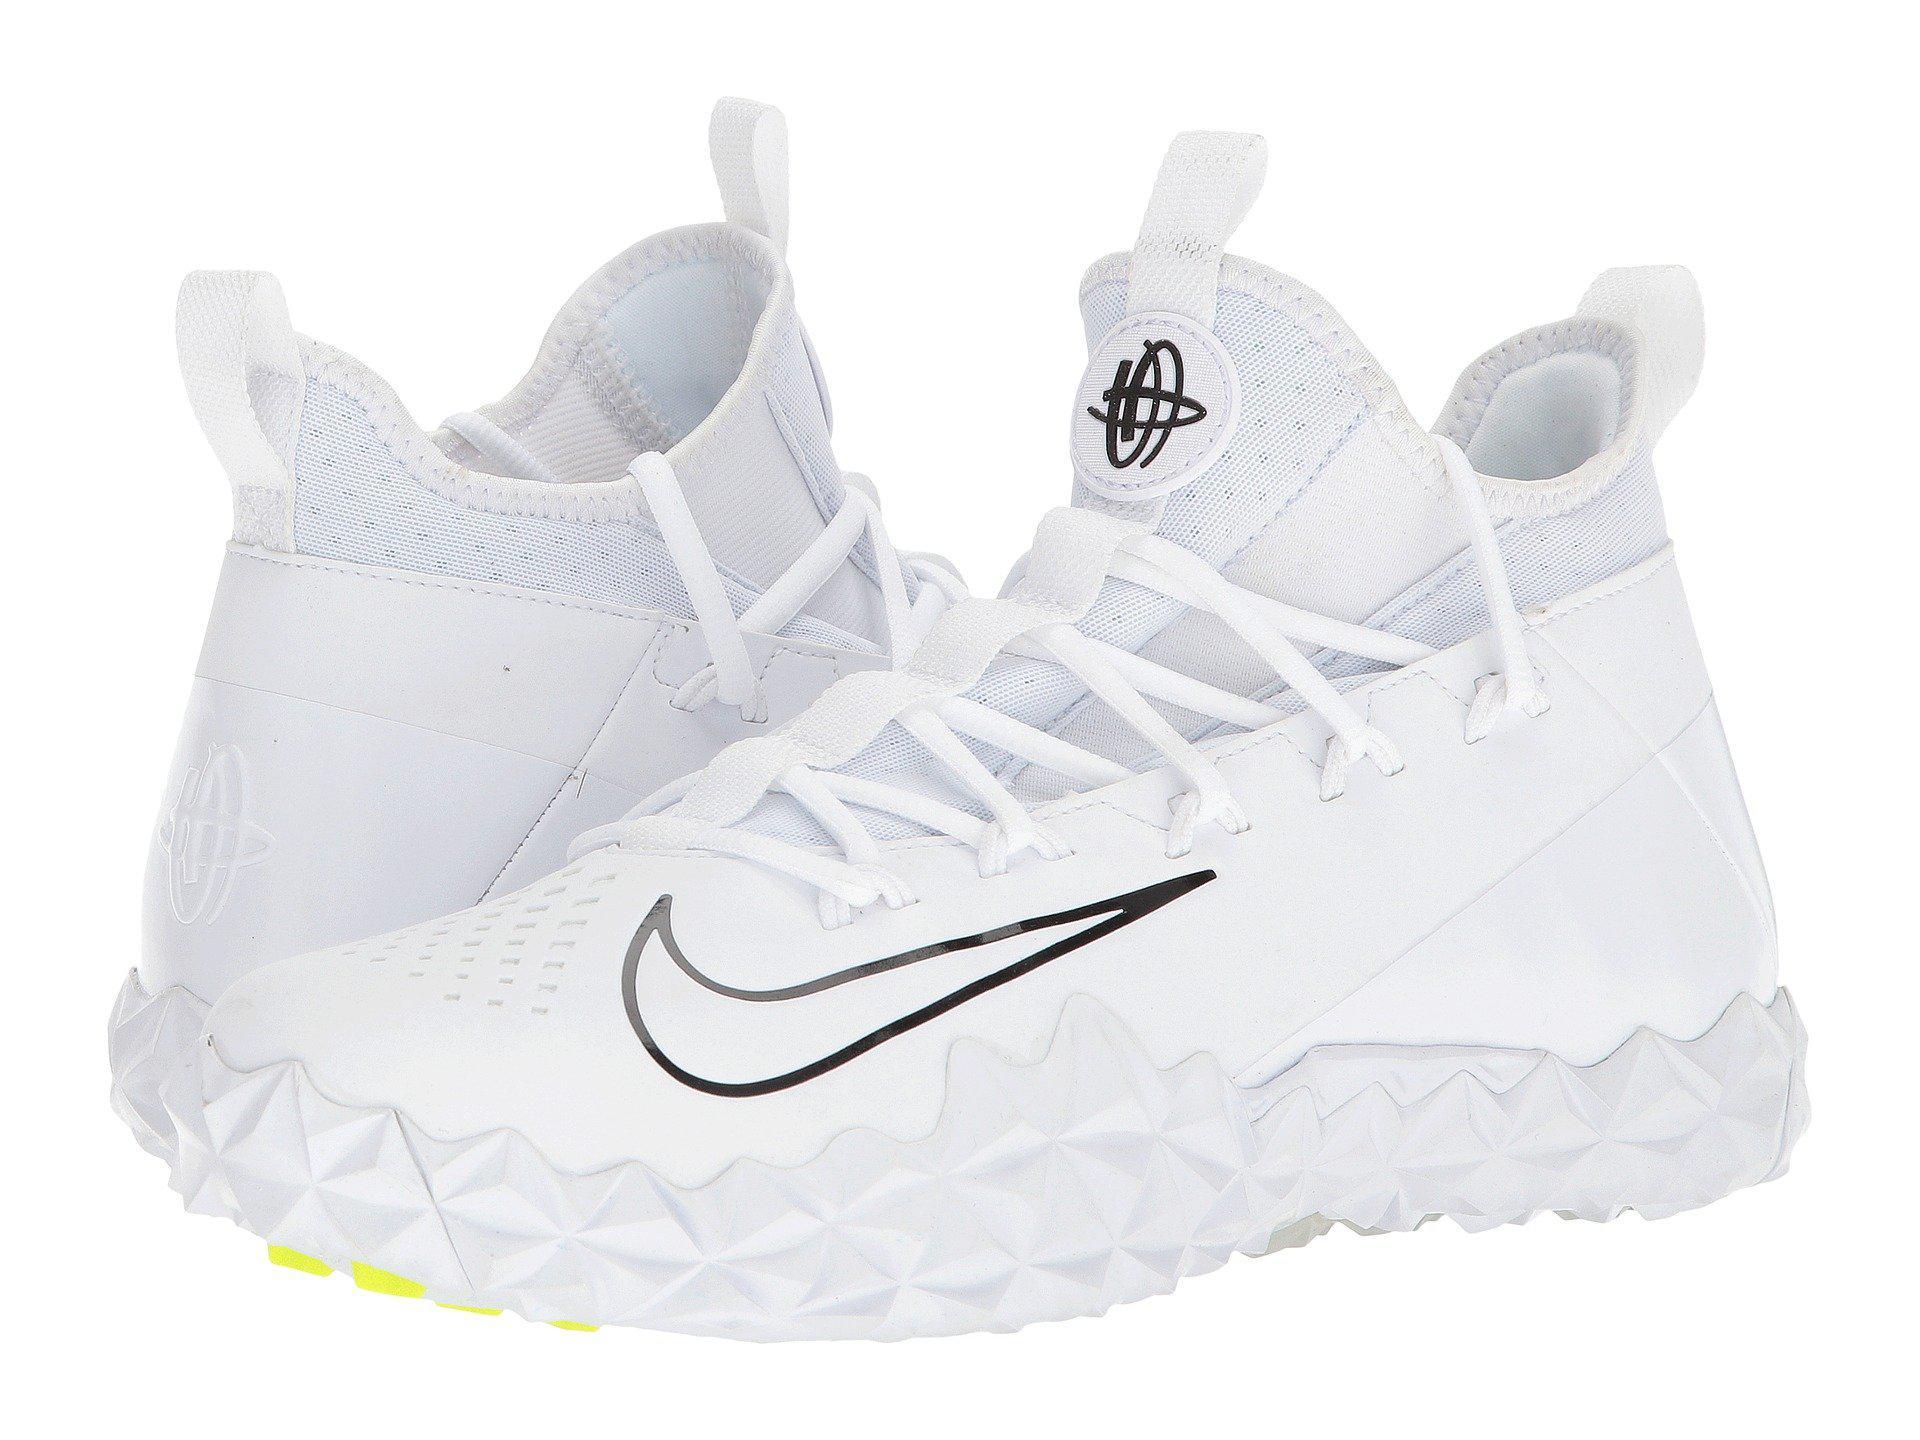 e6d7d300ea93 Lyst - Nike Alpha Huarache 6 Elt Turf Lax in White for Men